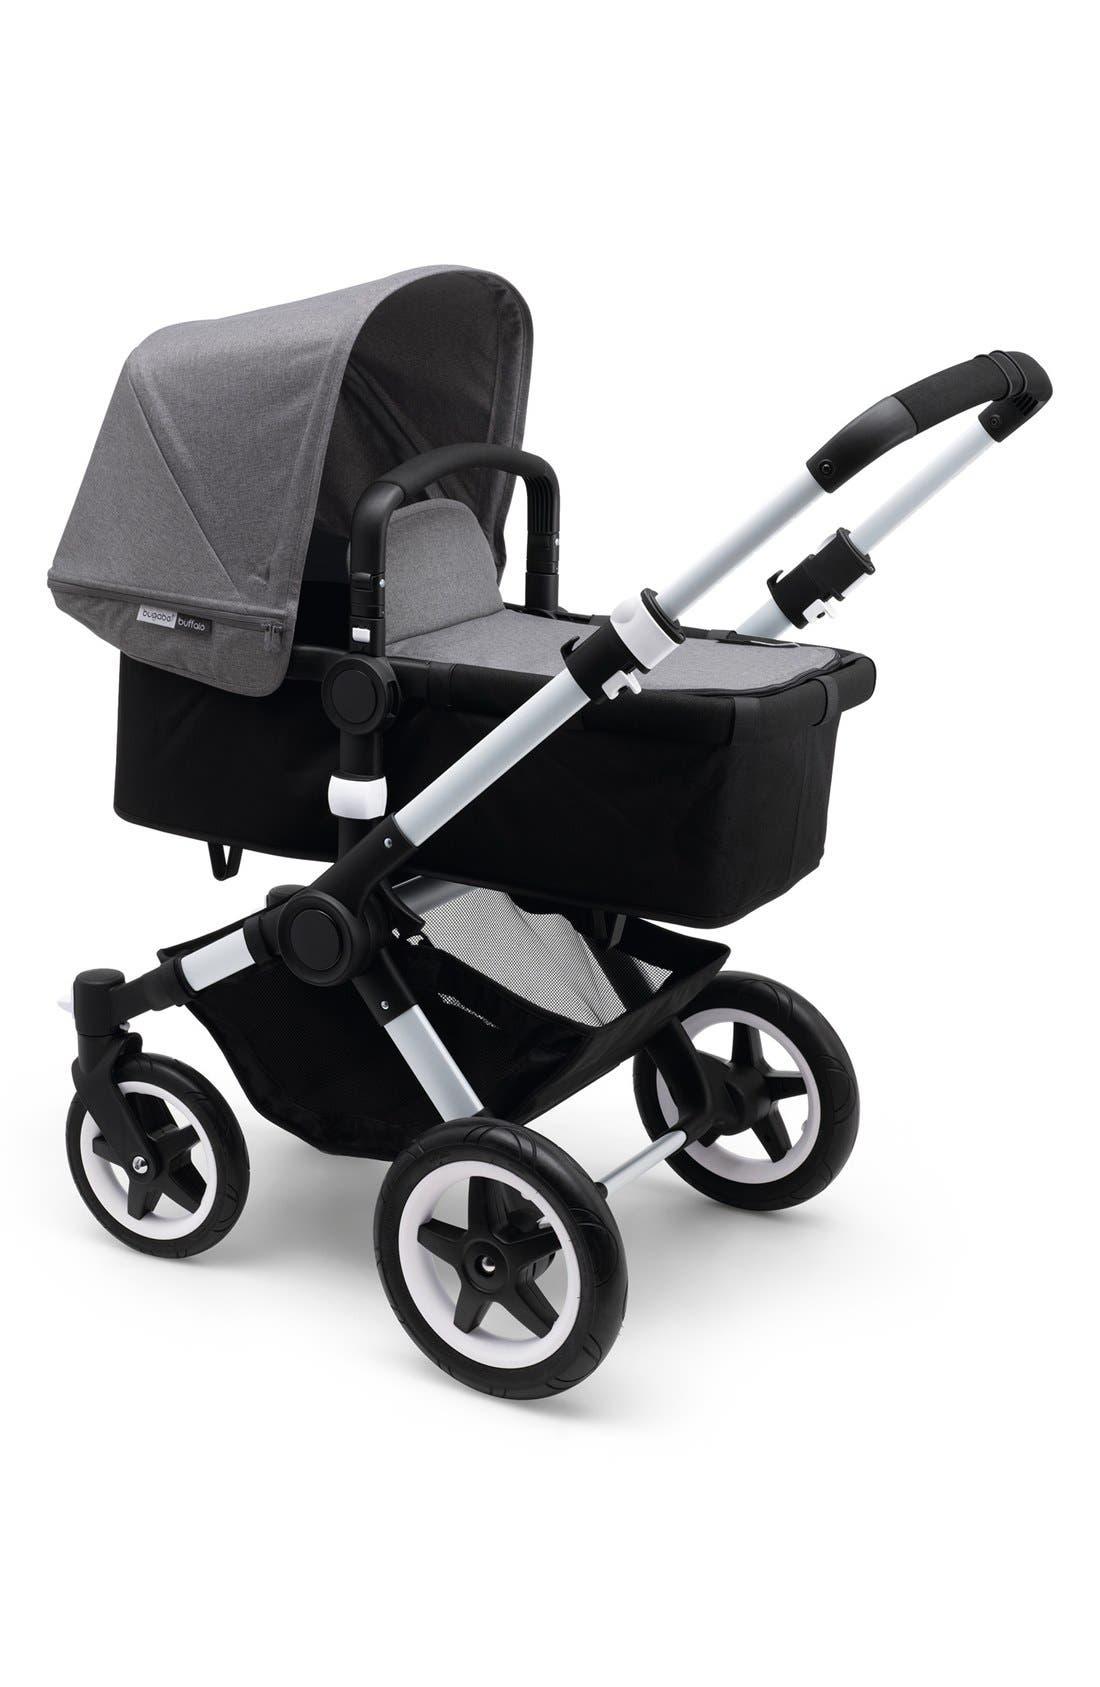 'Buffalo' Stroller Tailored Fabric Set with Extendable Sun Canopy,                             Main thumbnail 1, color,                             Grey Melange